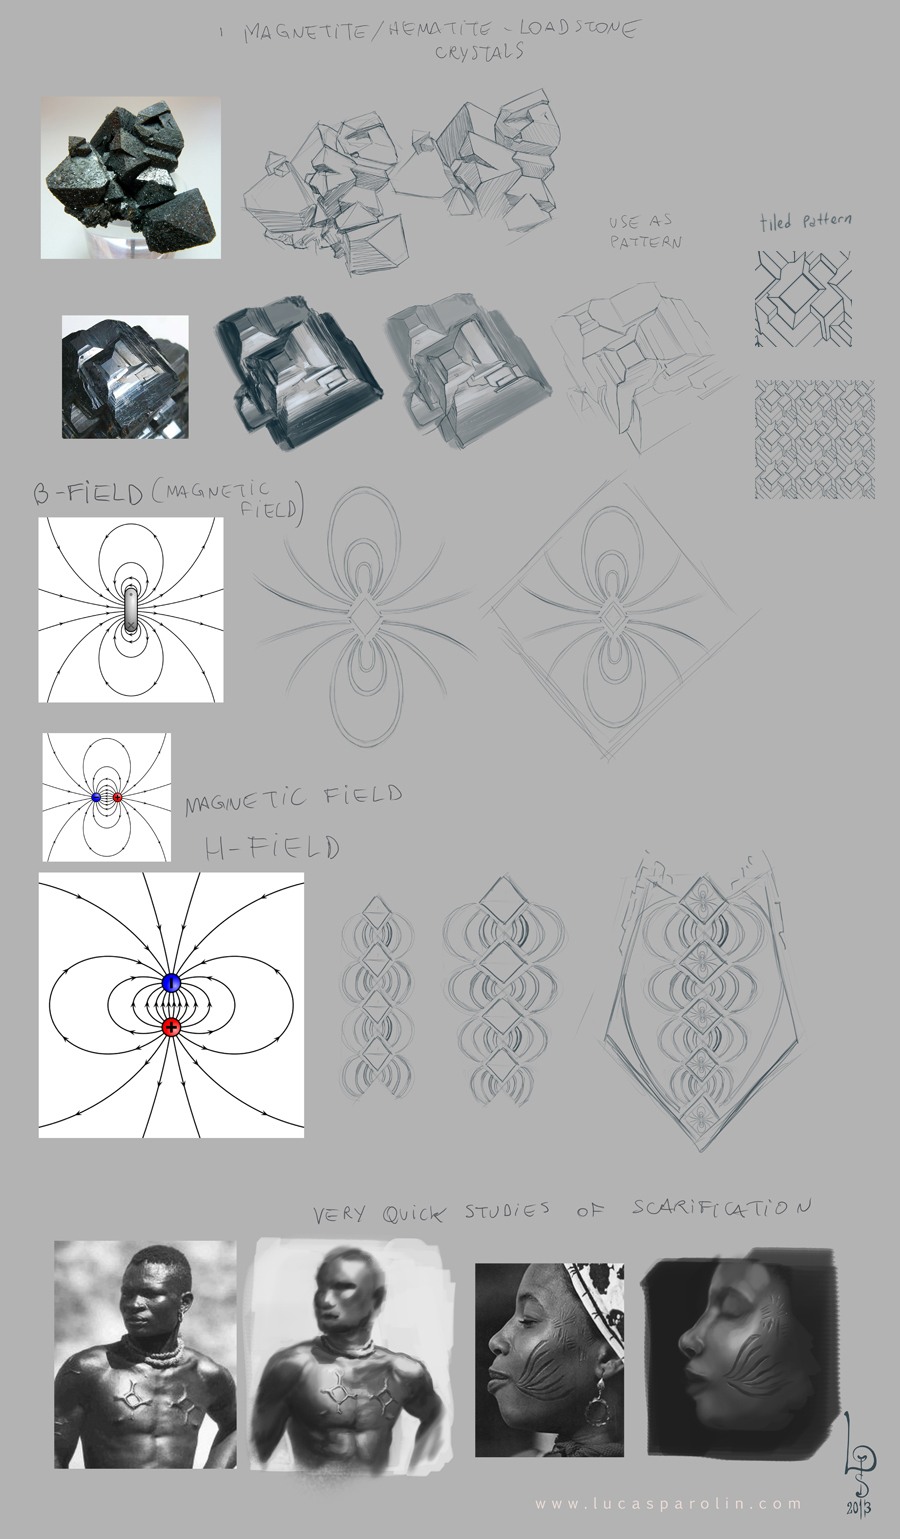 [Image: More_studies.jpg]